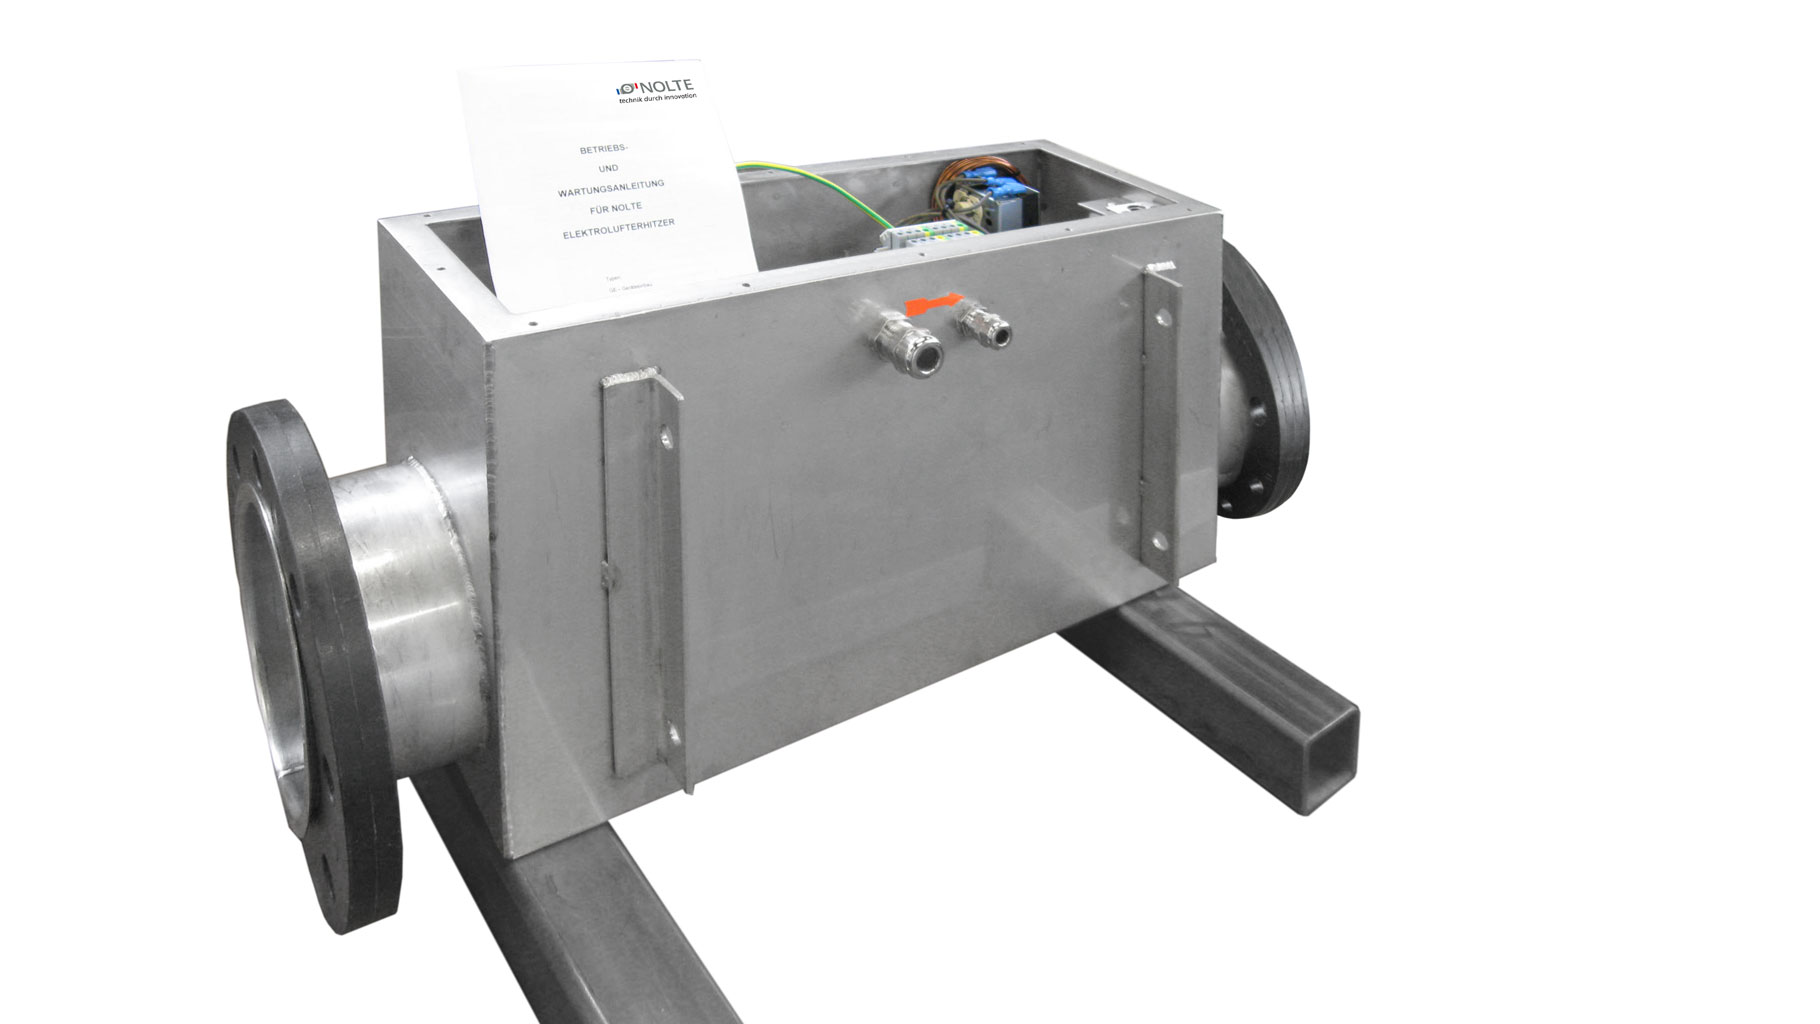 produkte-elektrolufterhitzer-typ-re-spezial-alfred-nolte-gmbh